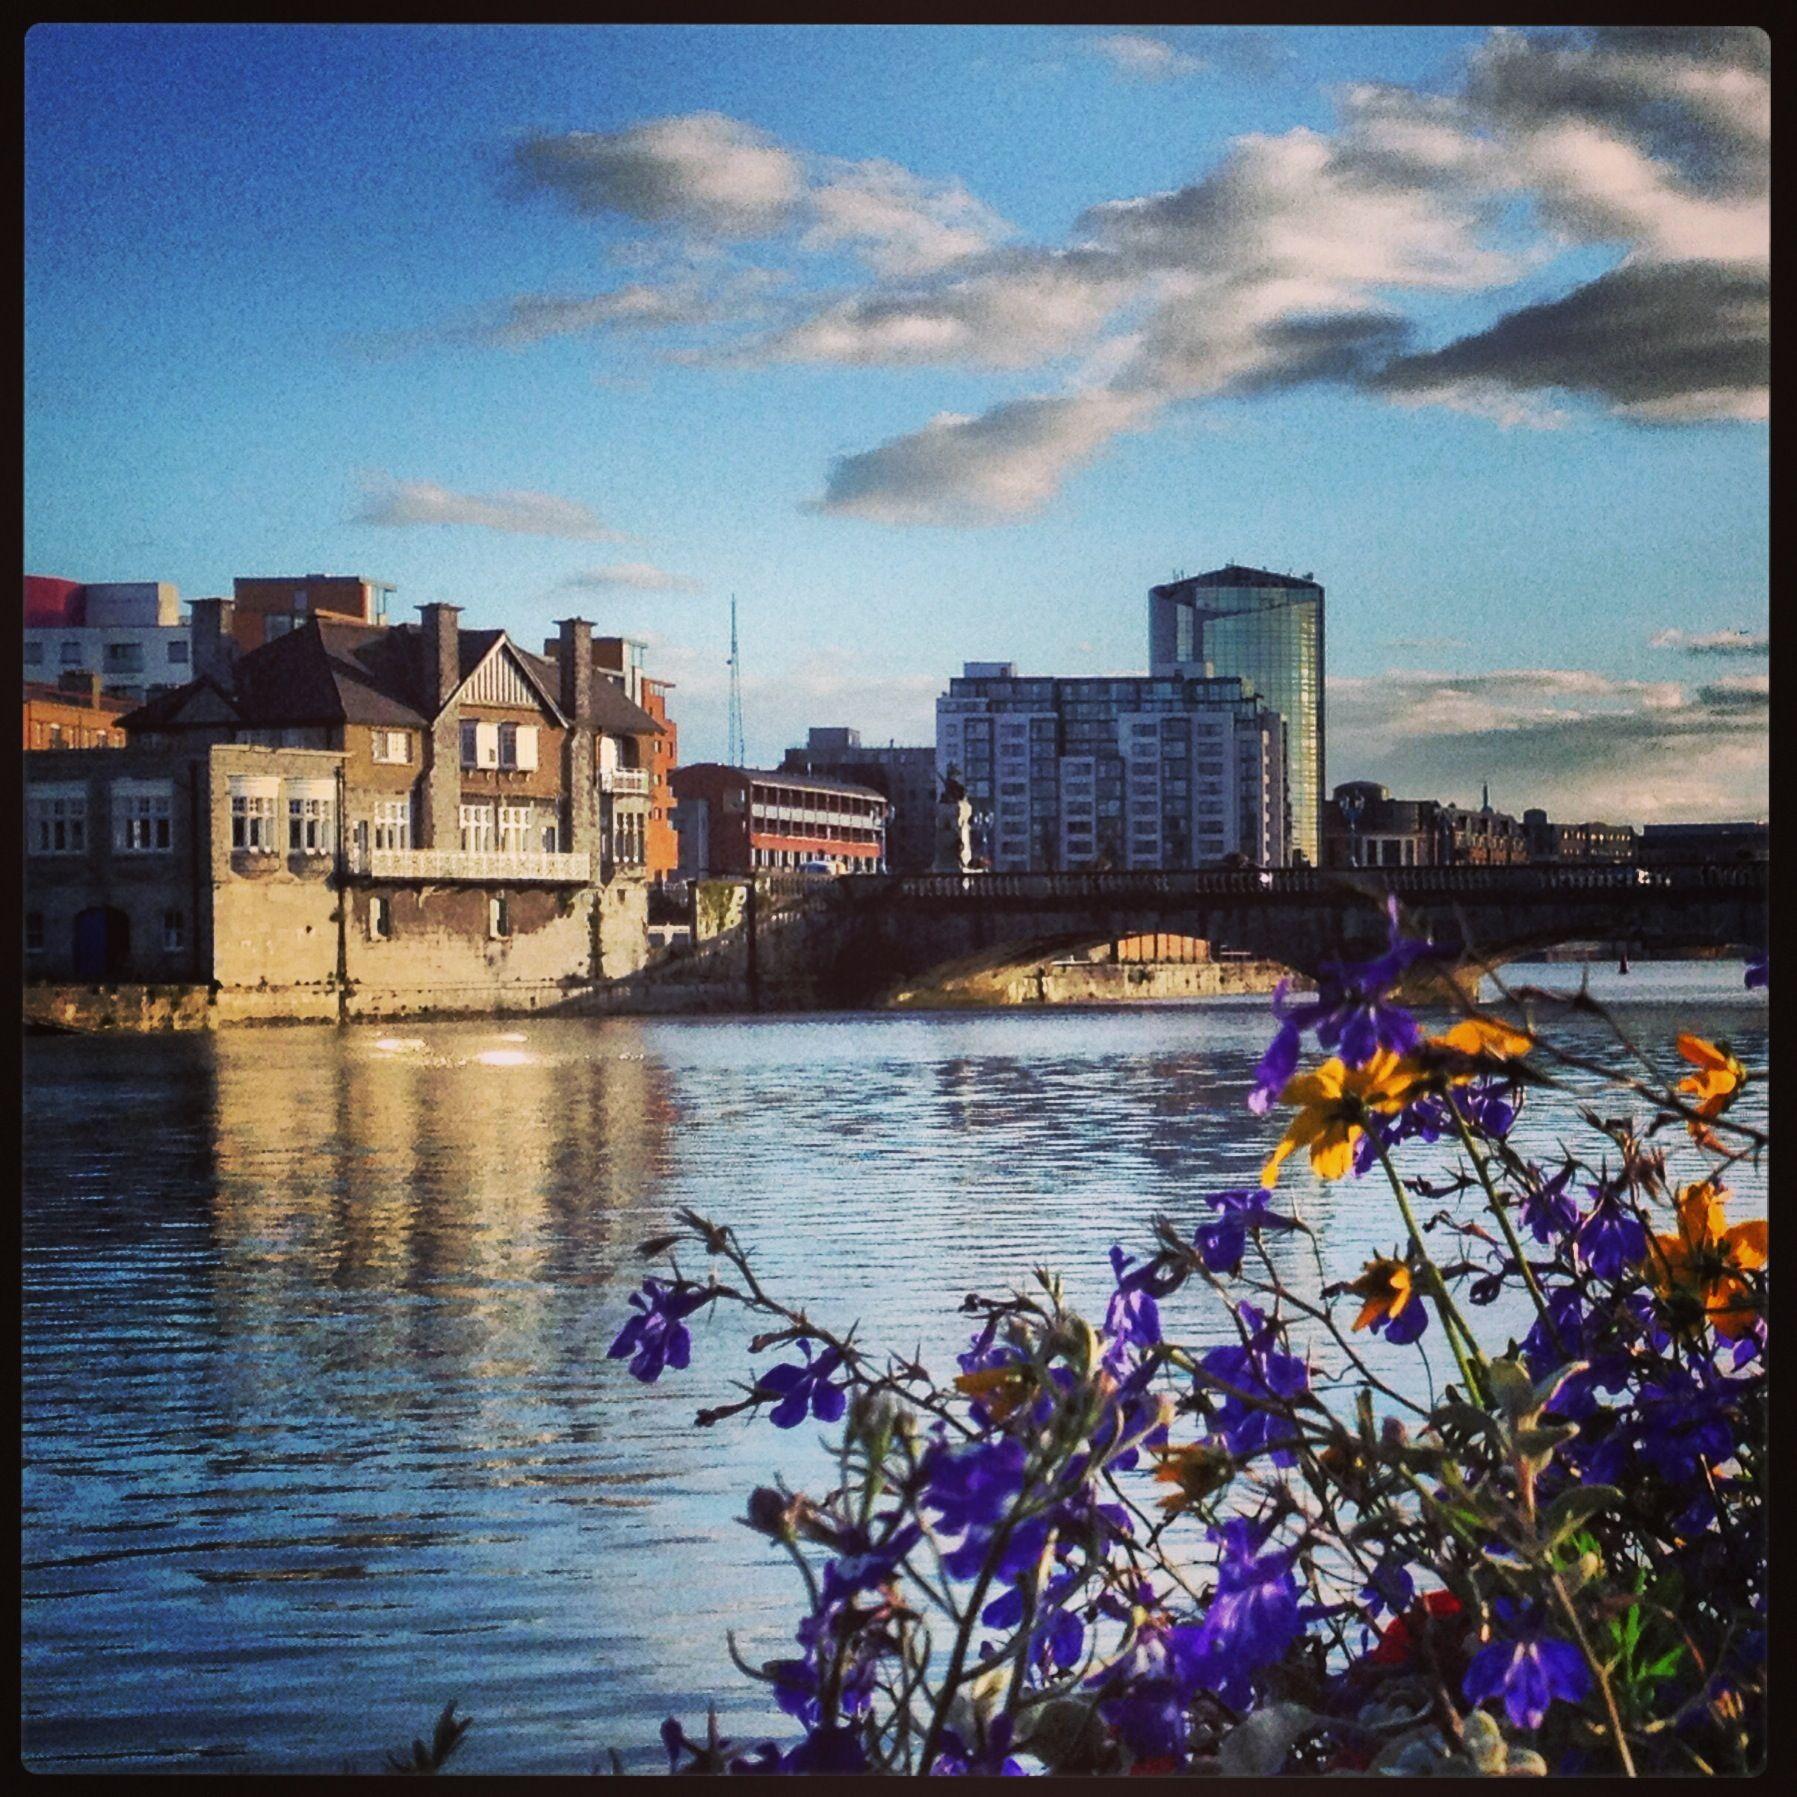 Limerick City Limerick City Limerick Ireland County Limerick